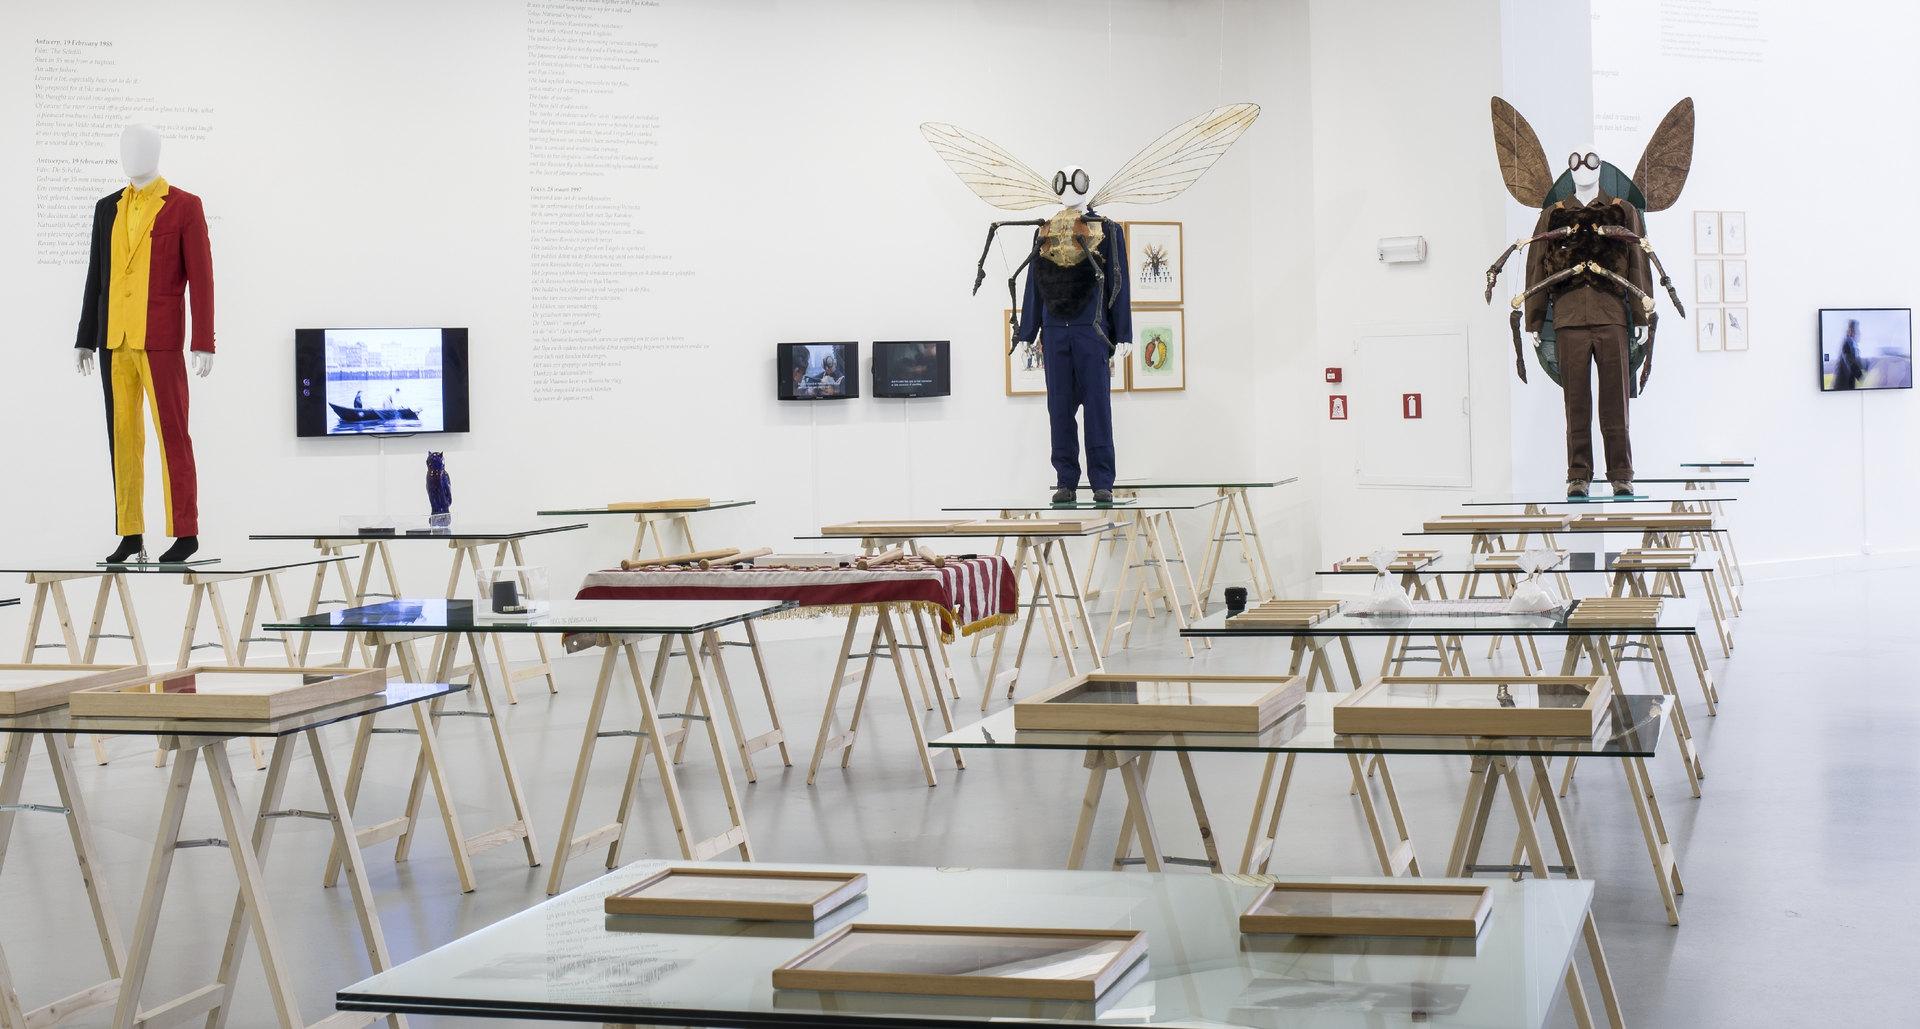 Jan_Fabre,_exhibition_view_M_HKA_2015_photo_M_HKAclinckx10